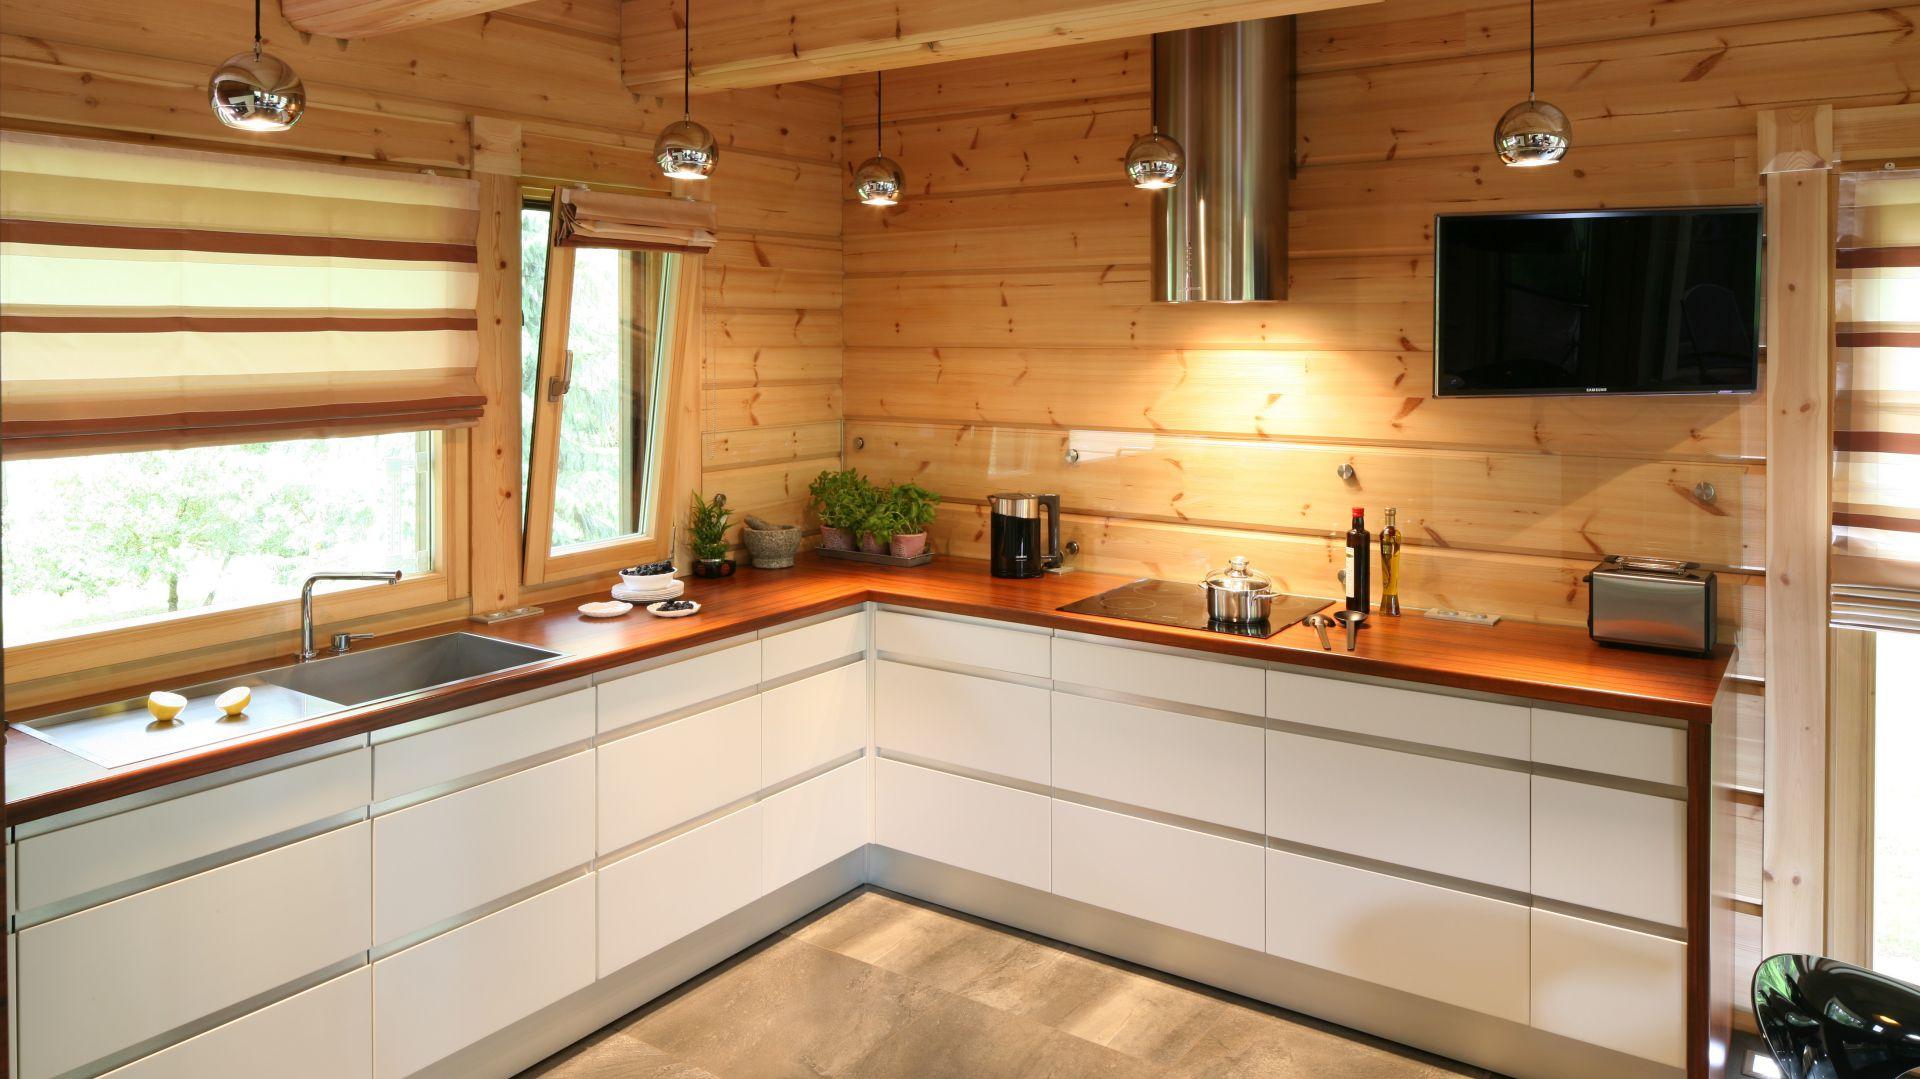 ta kuchnia to najlepszy 10 pomys w na bia kuchni ocieplon drewnem strona 9. Black Bedroom Furniture Sets. Home Design Ideas